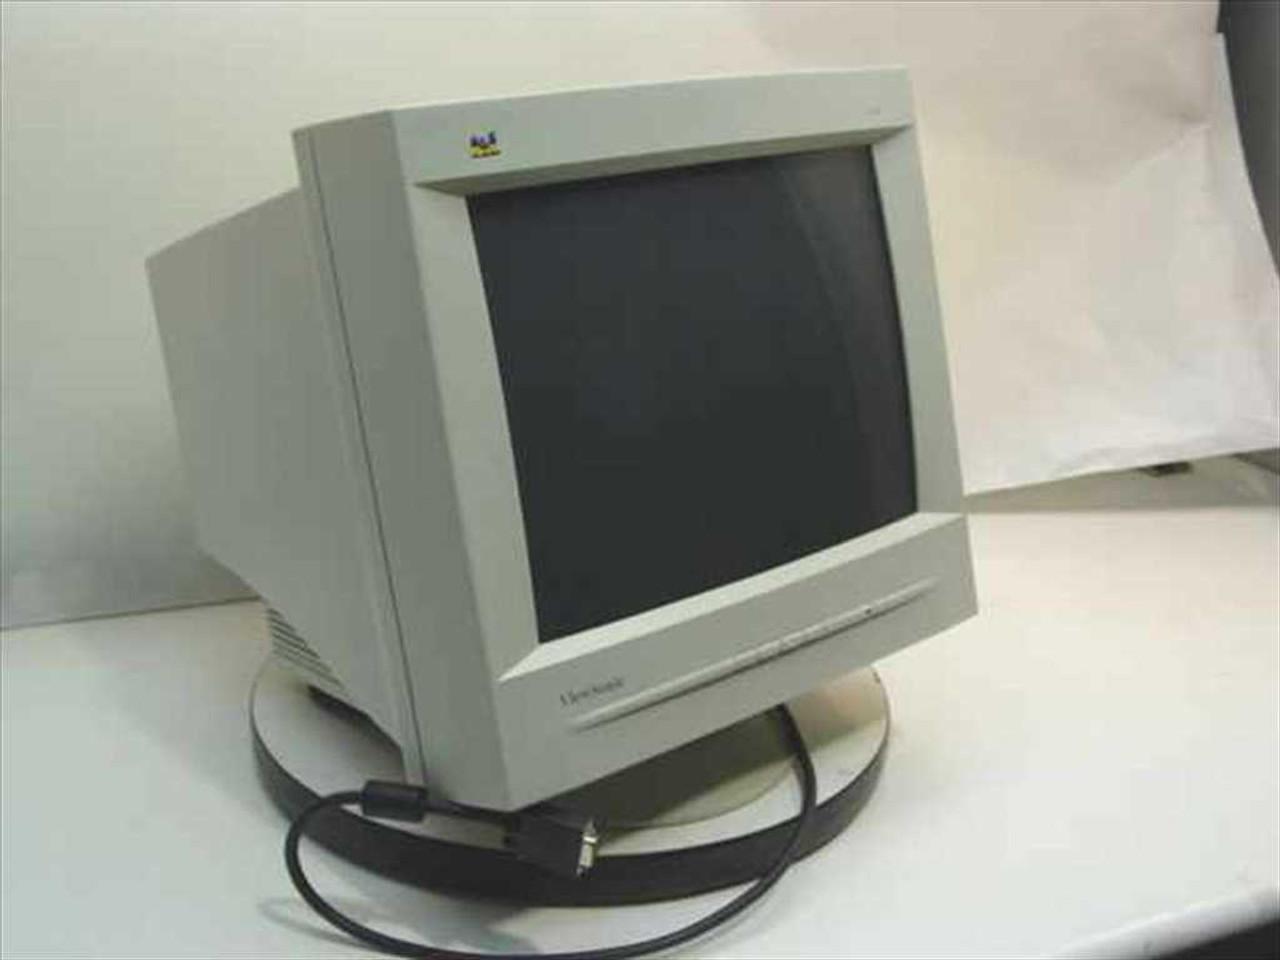 Viewsonic E771 17 Crt Monitor Svga Cable Vcdts21445 28